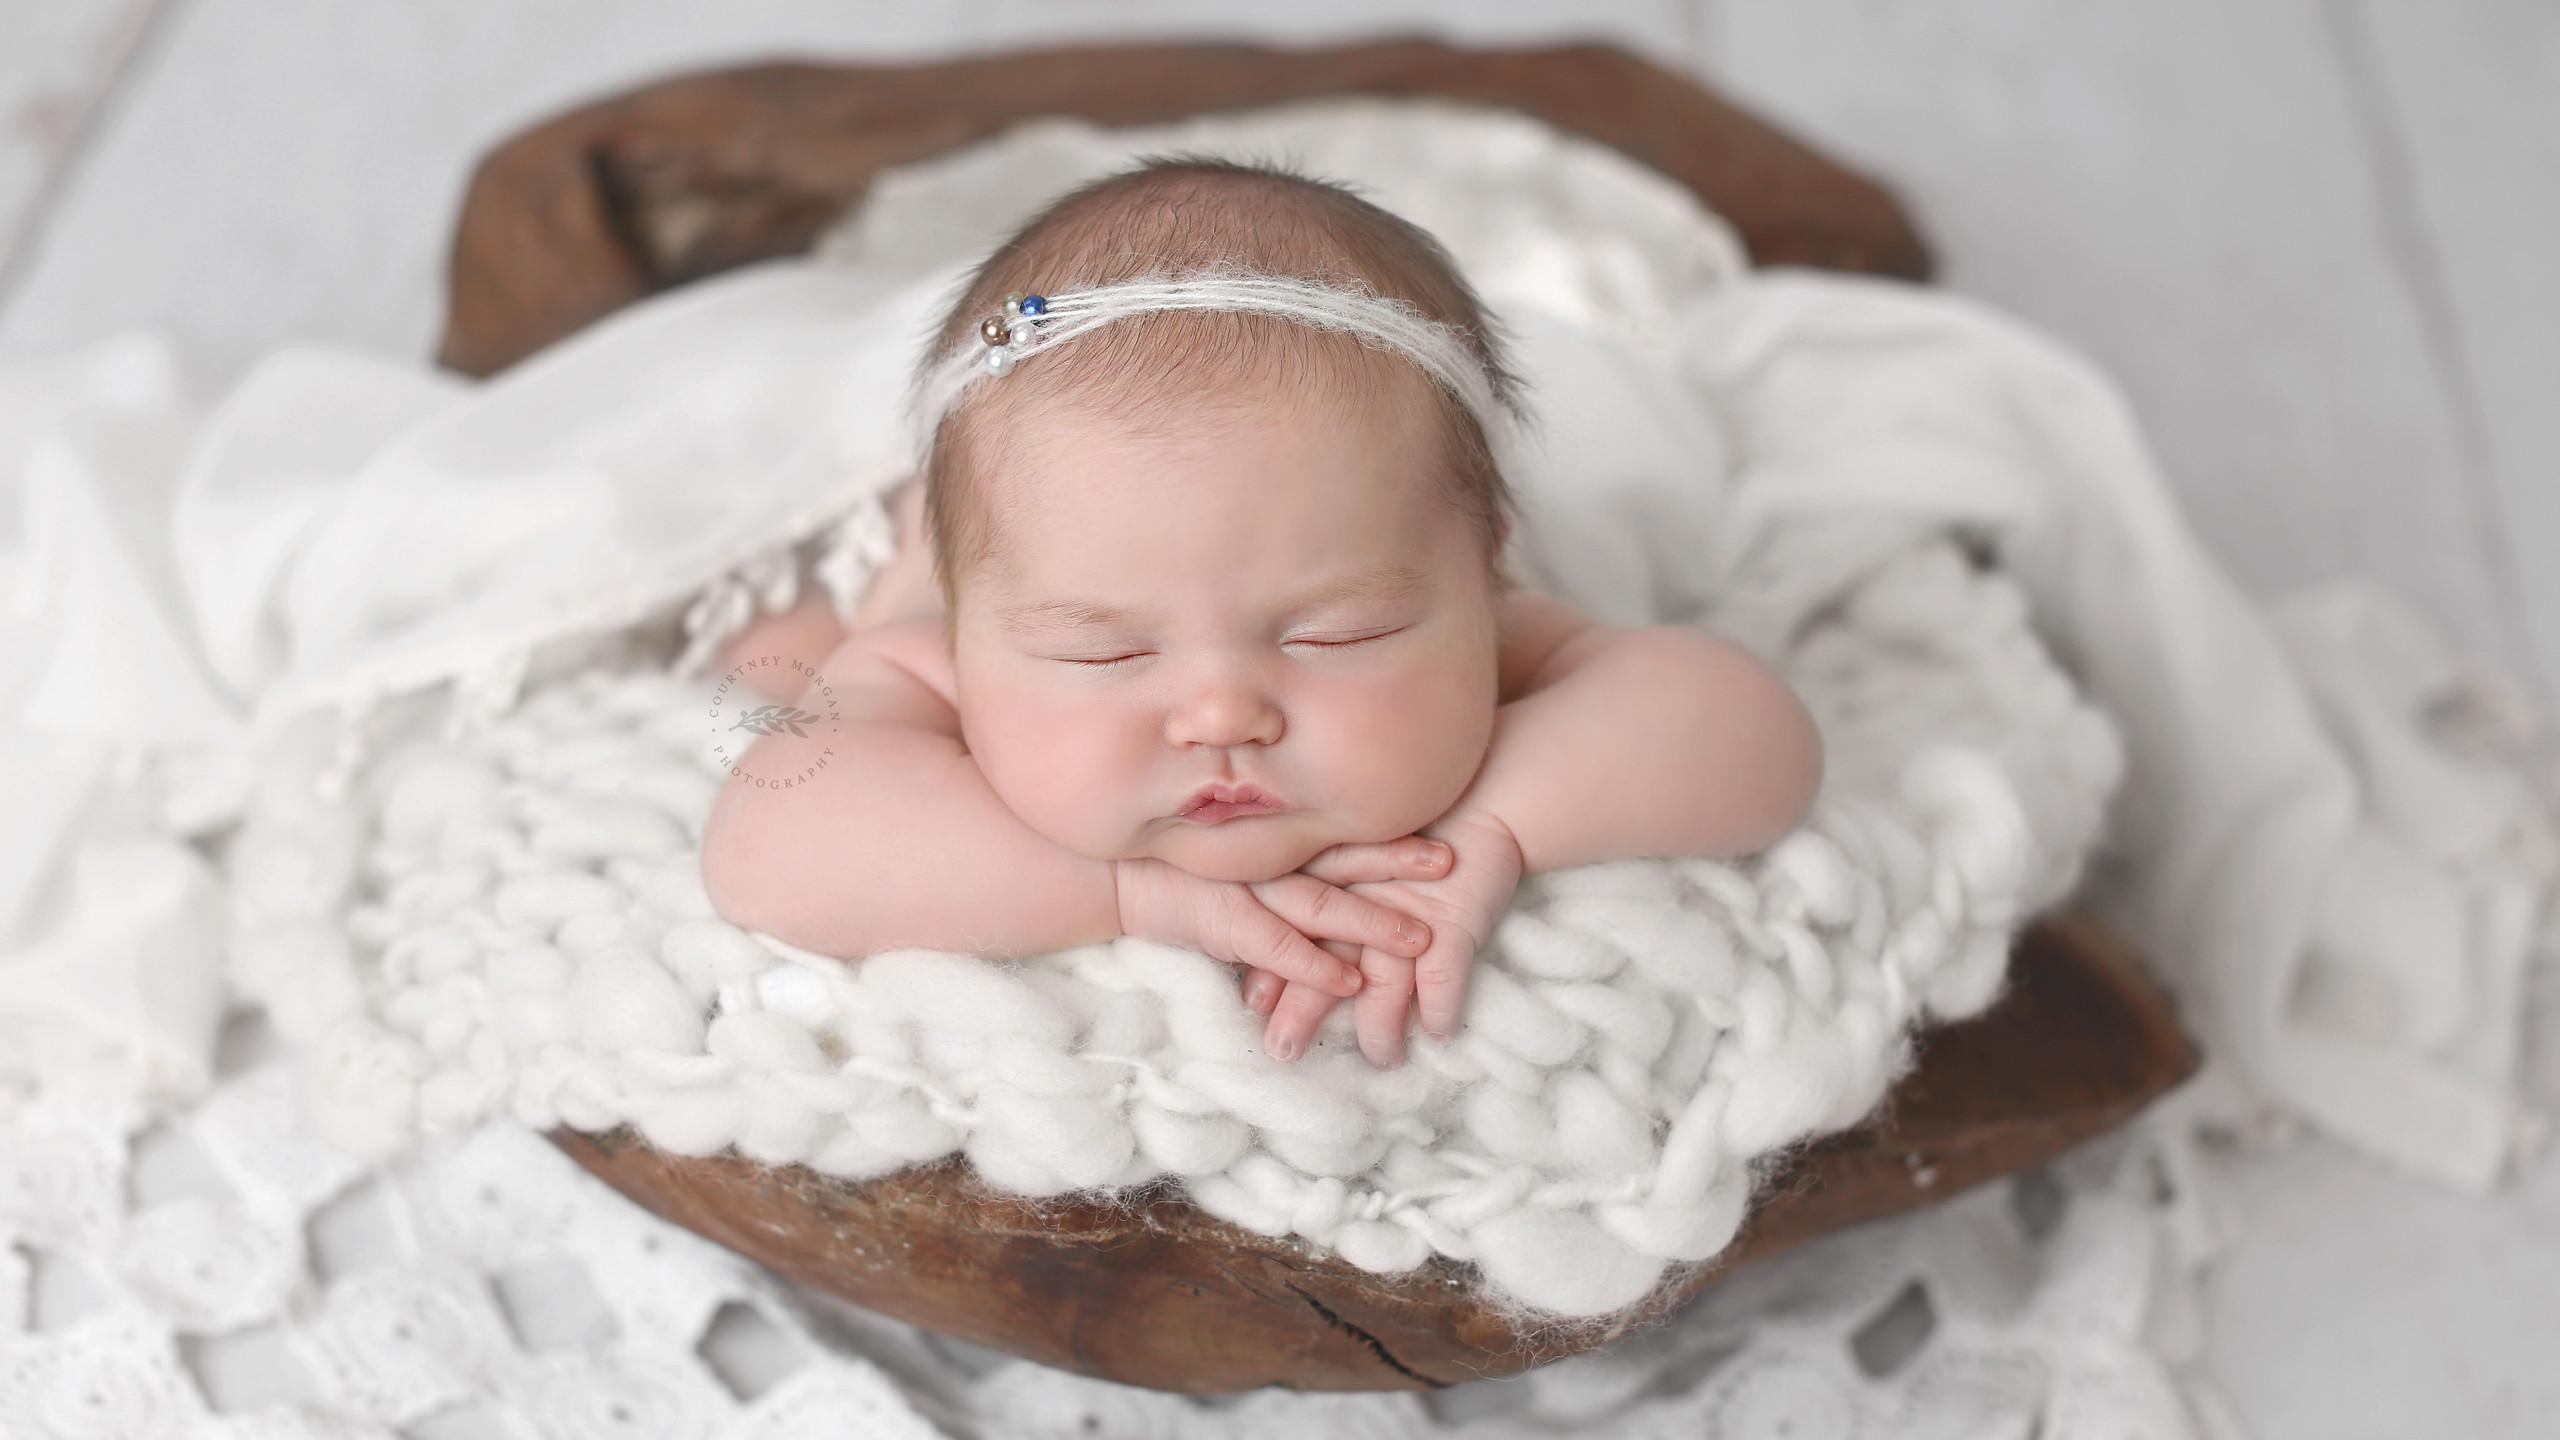 Plano Milestone Photographer, starting with newborn through the first year.